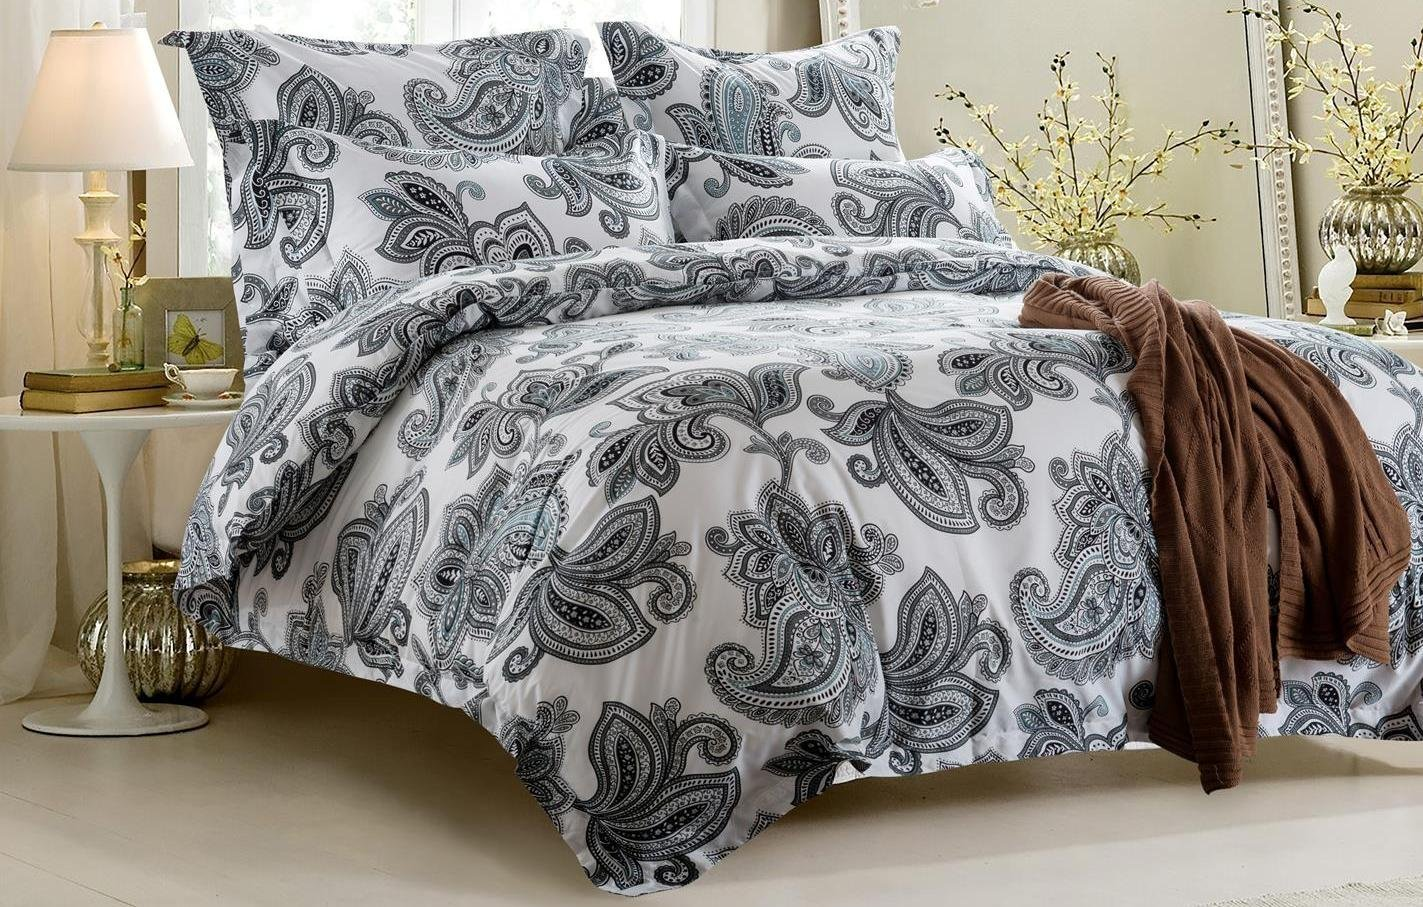 6pc Black and White Design Bedding Set